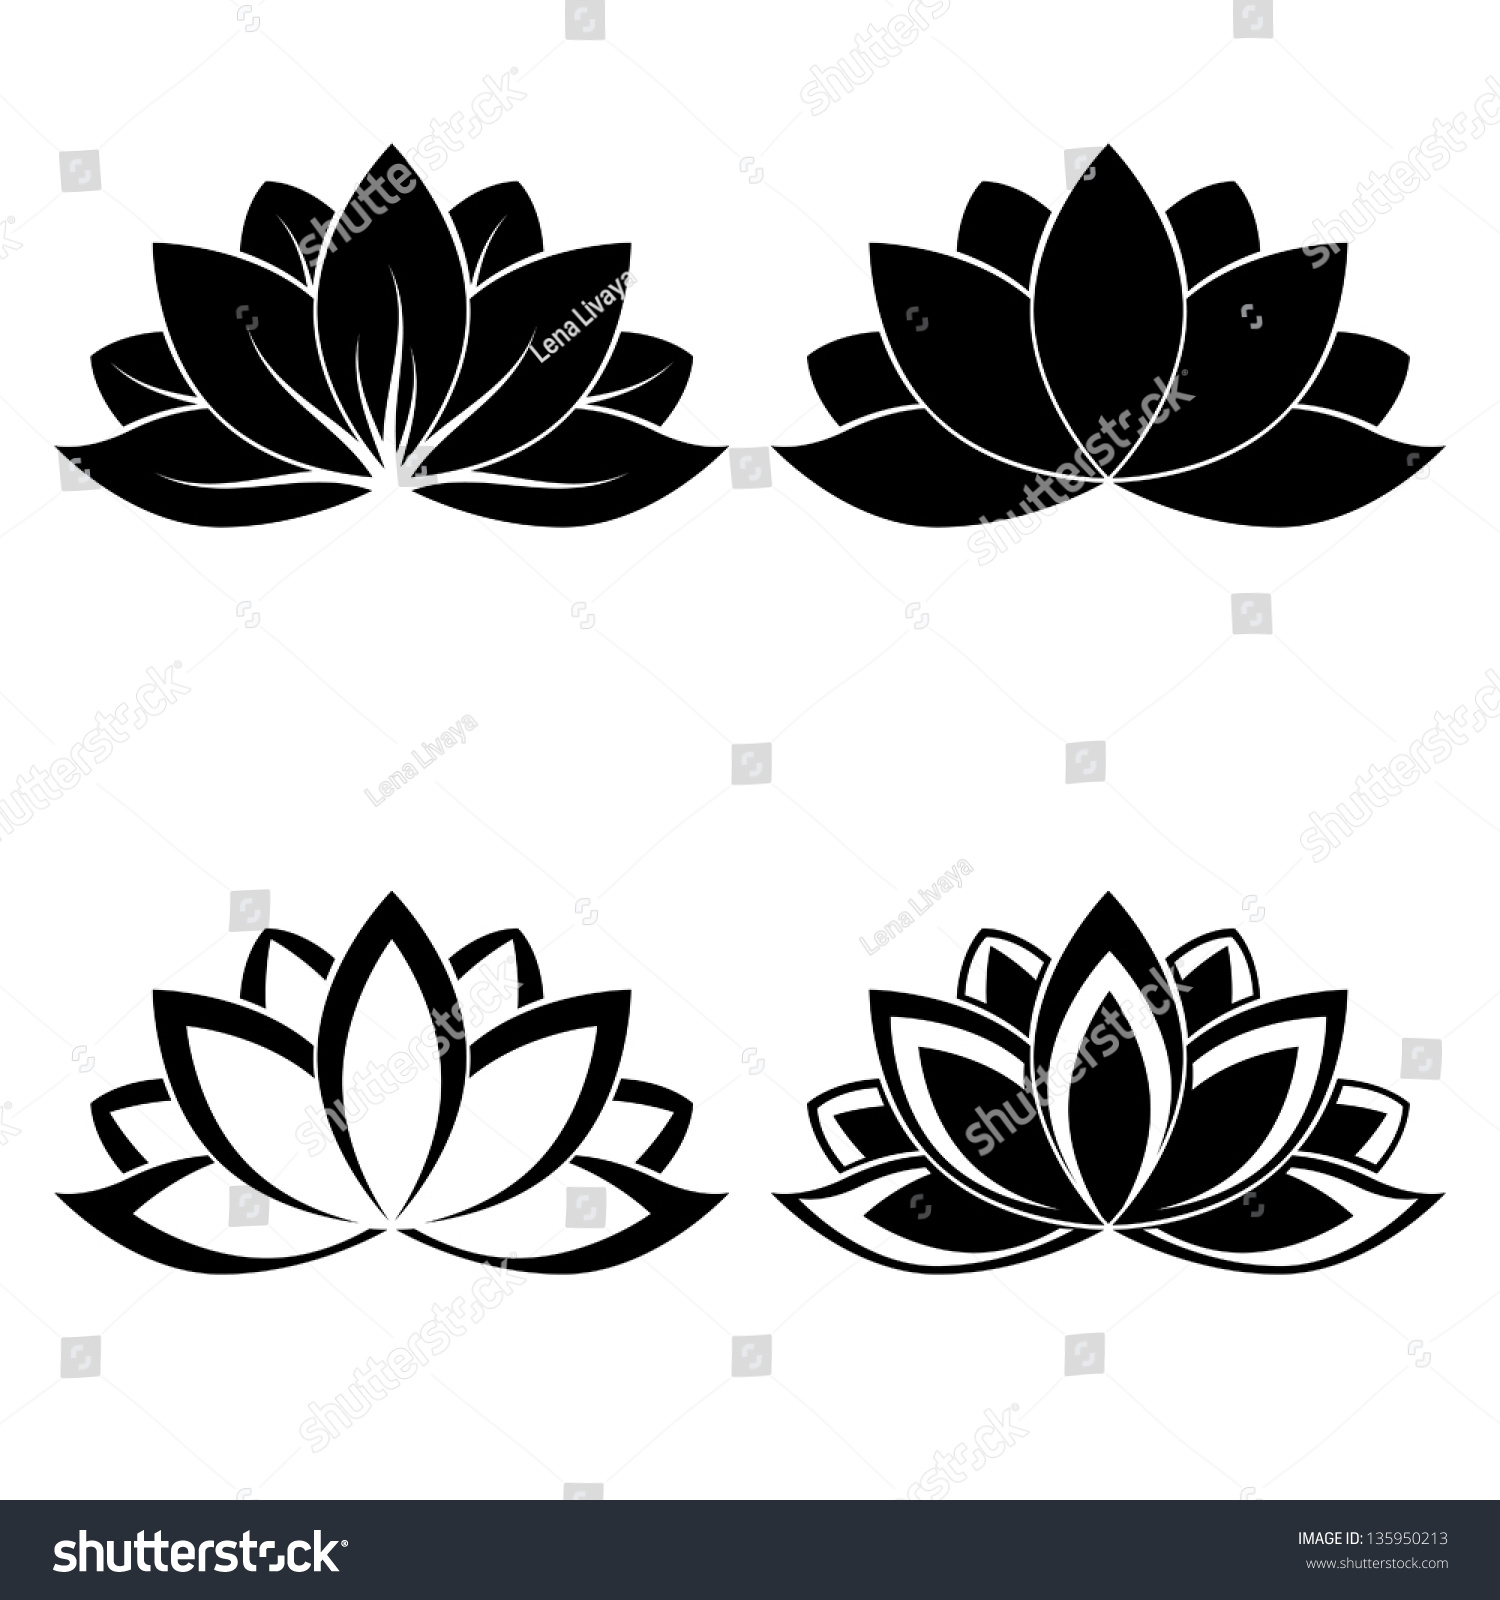 Lotus Flower Black And White Design Www Imgkid Com The